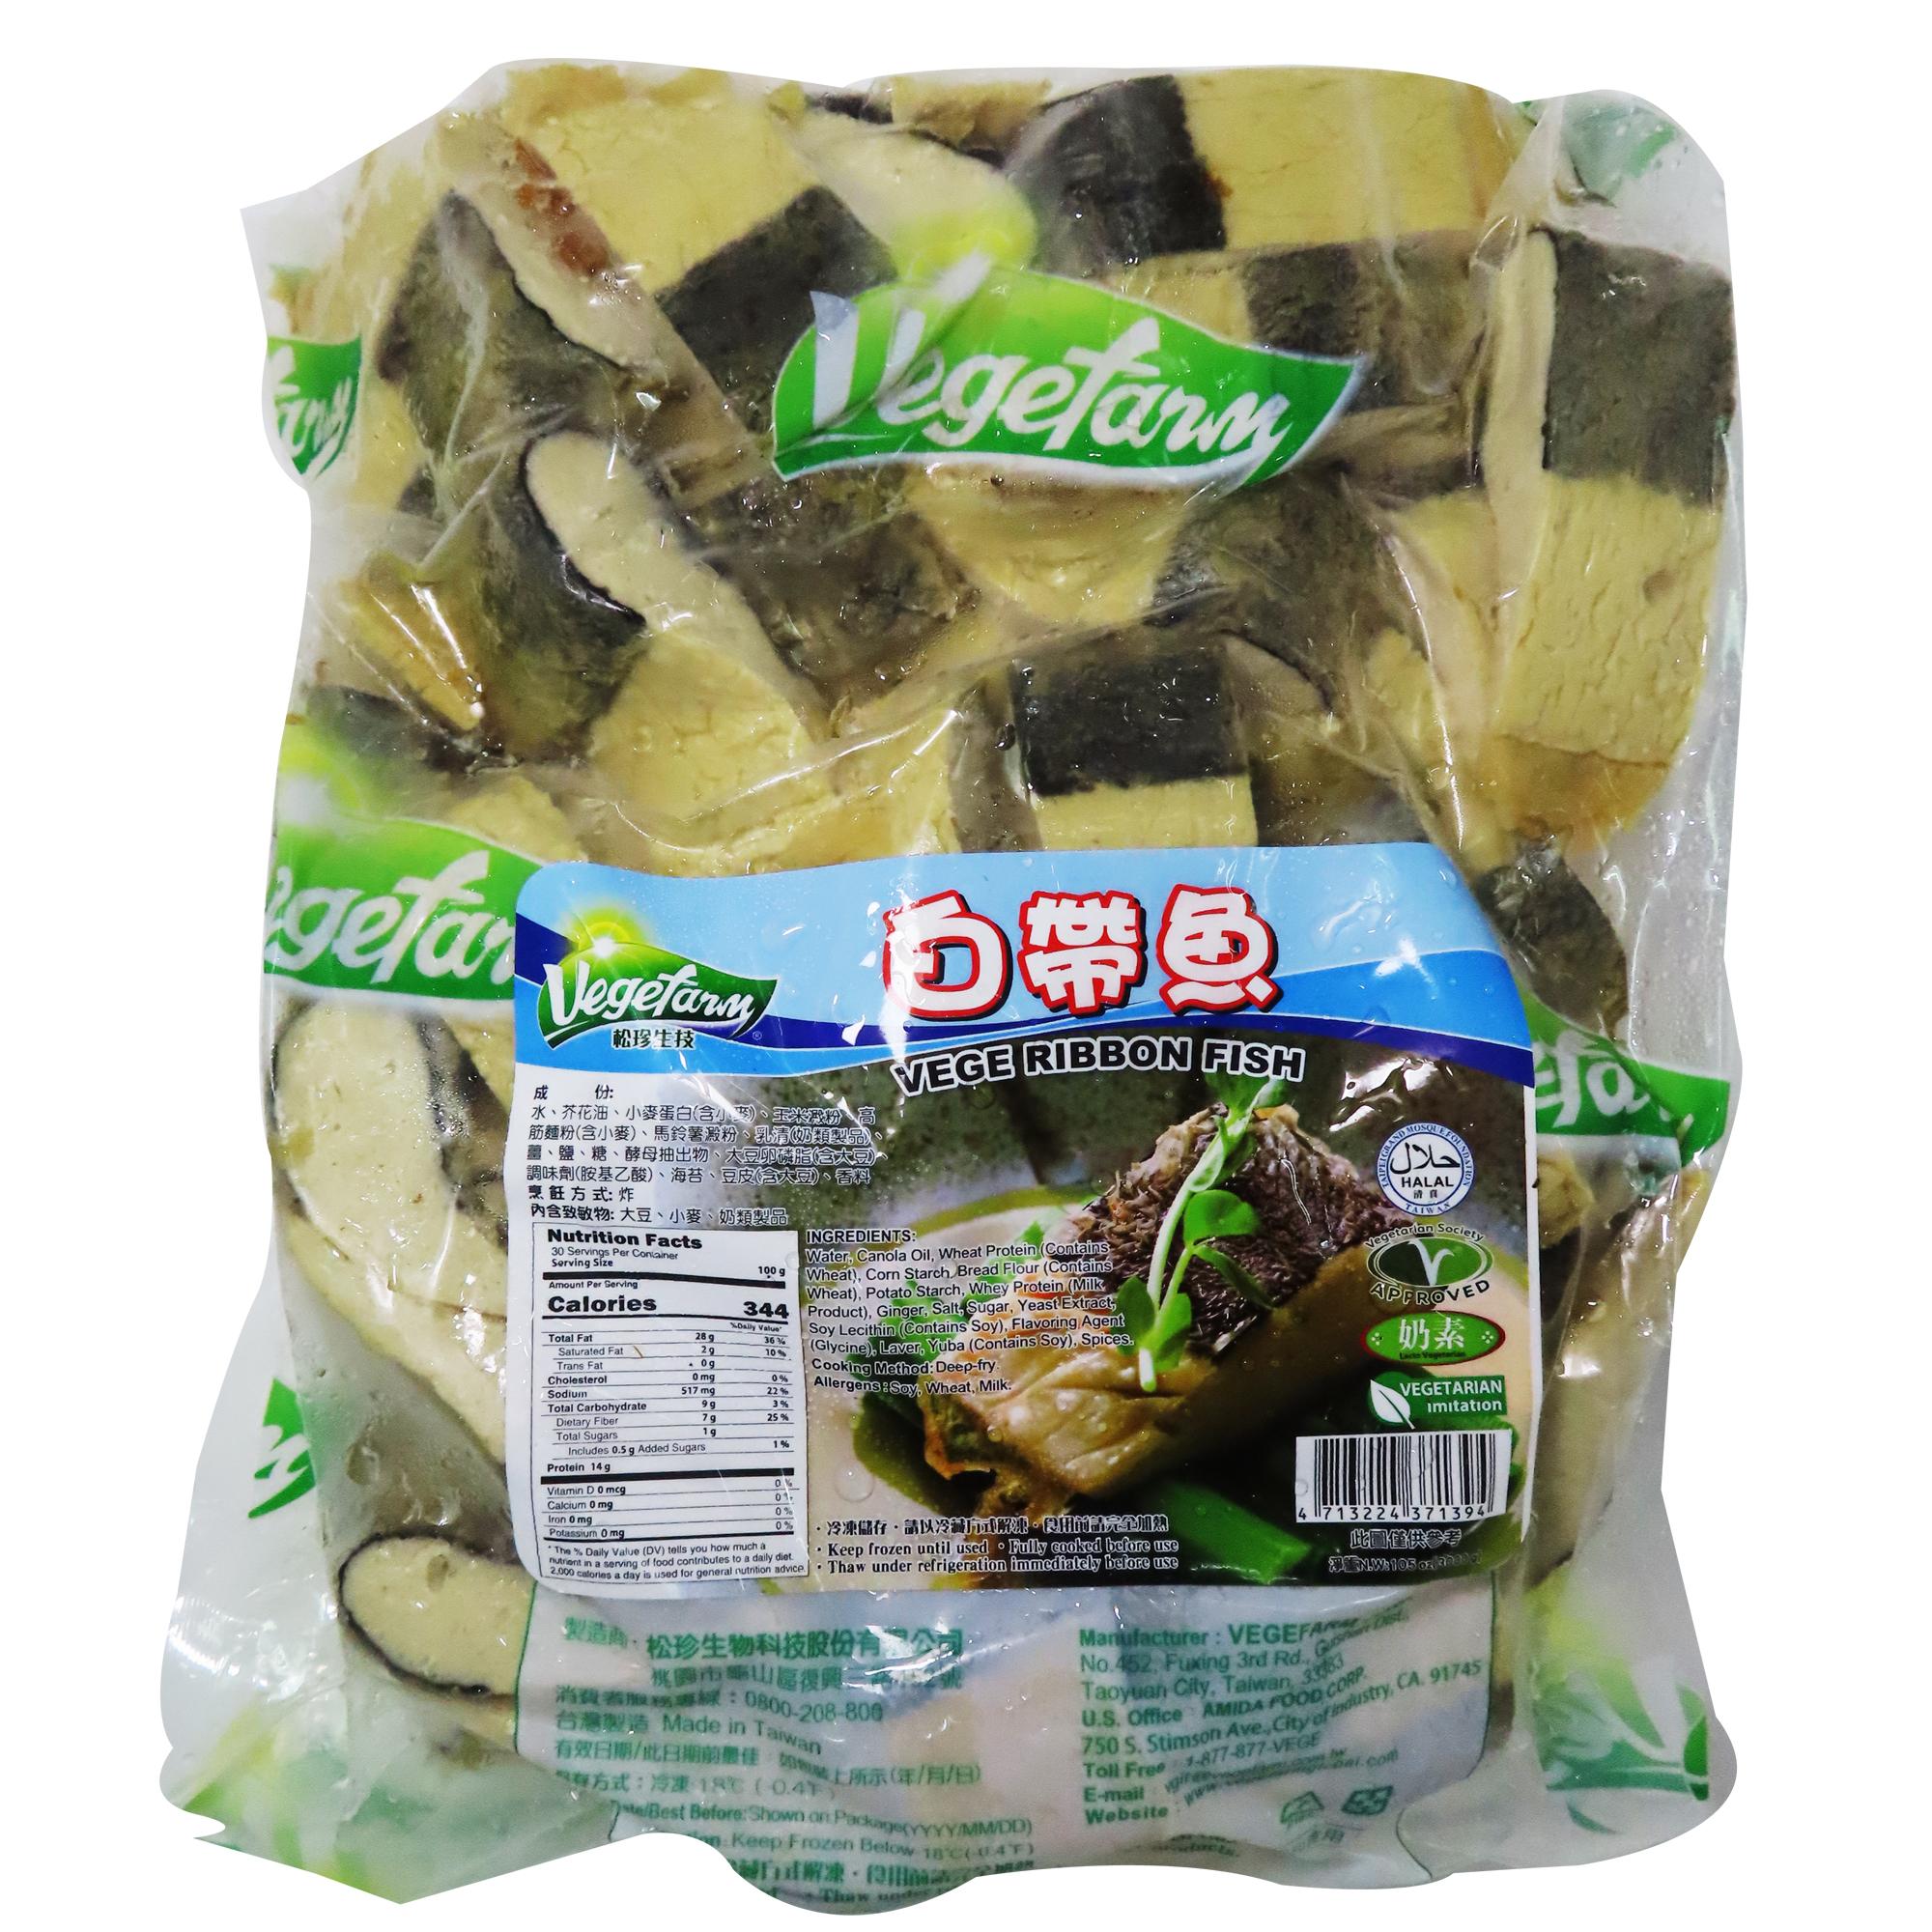 Image Vegefarm Ribbon Fish Fillet 松珍 - 白带鱼 (奶素)3000 grams